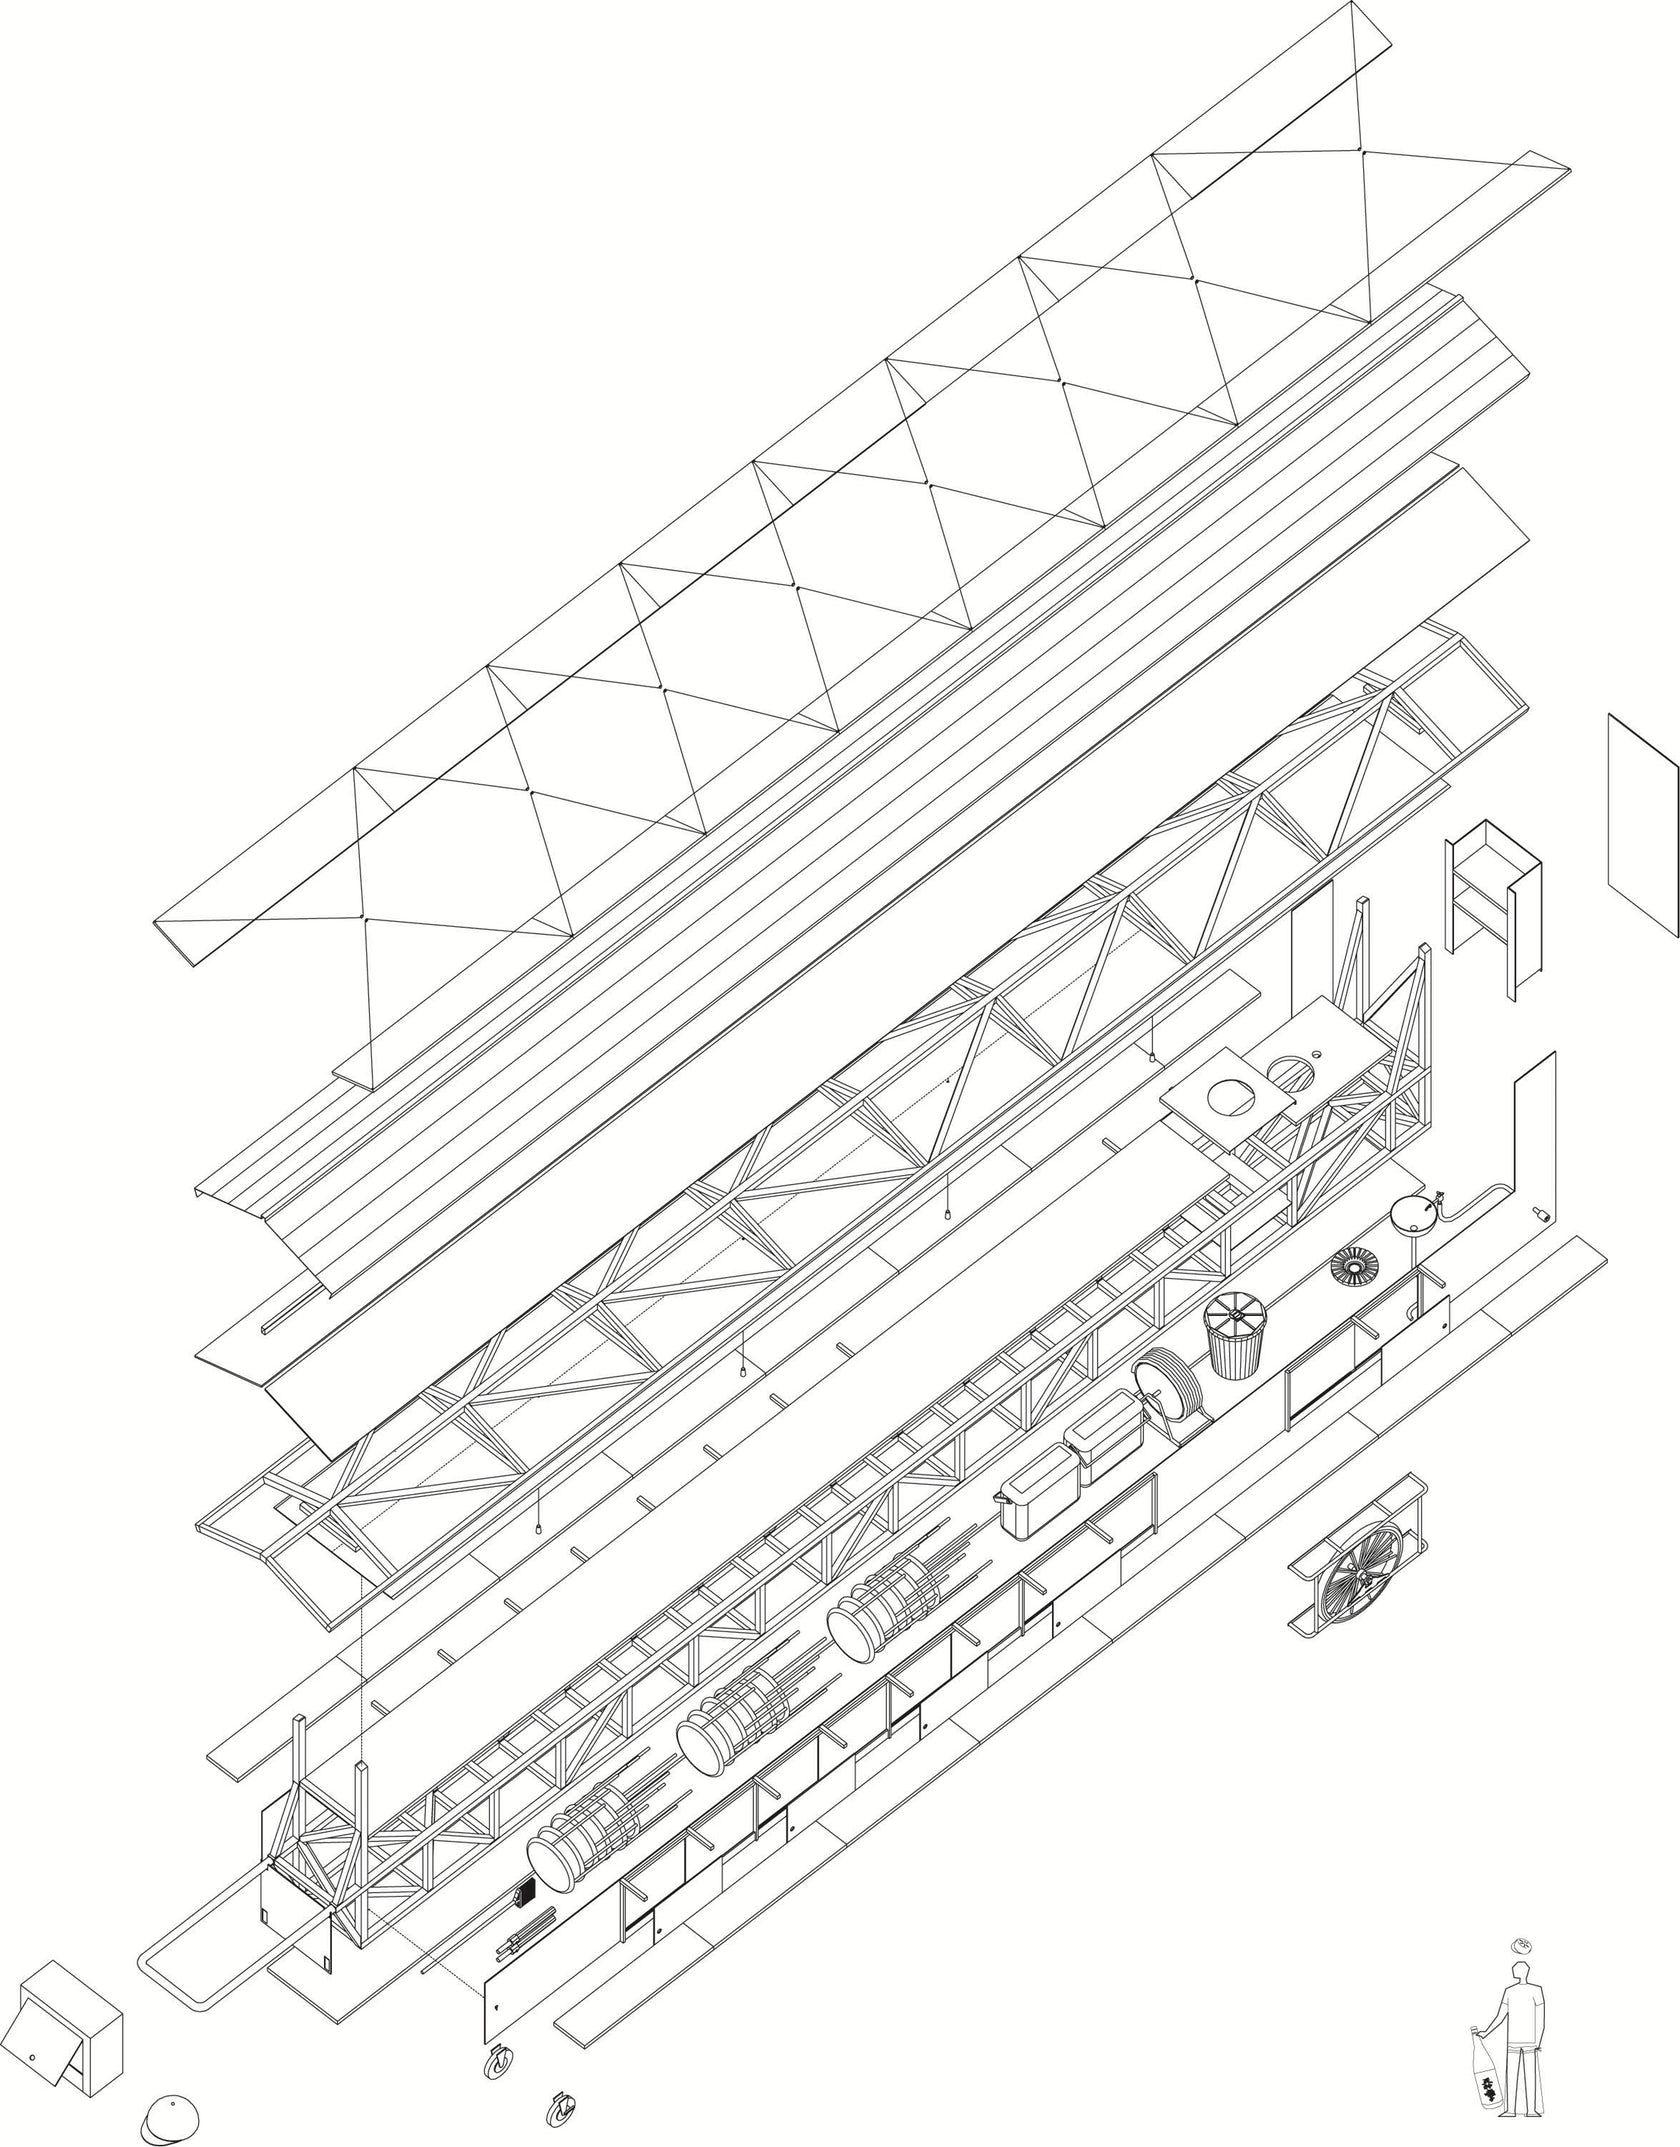 small resolution of resultado de imagen para atelier bow wow white limousine yatai